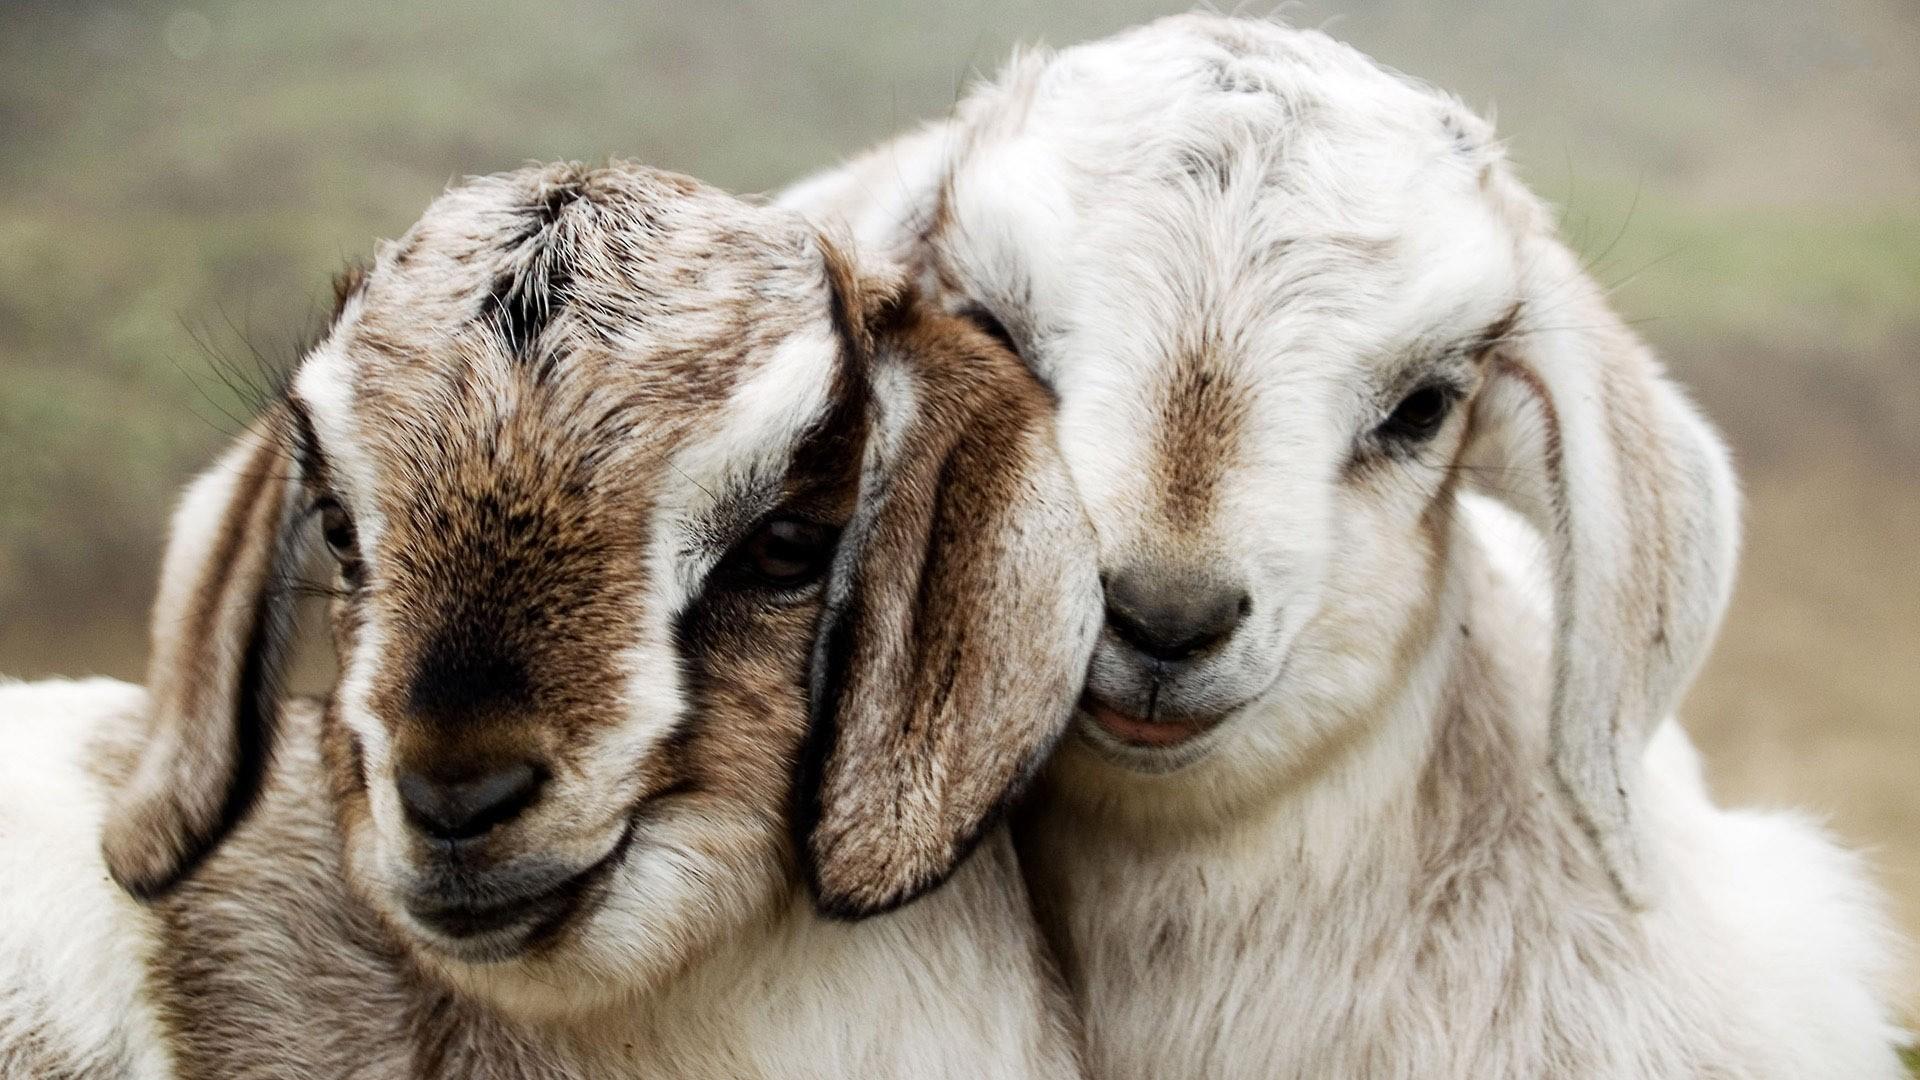 Goat Wallpaper